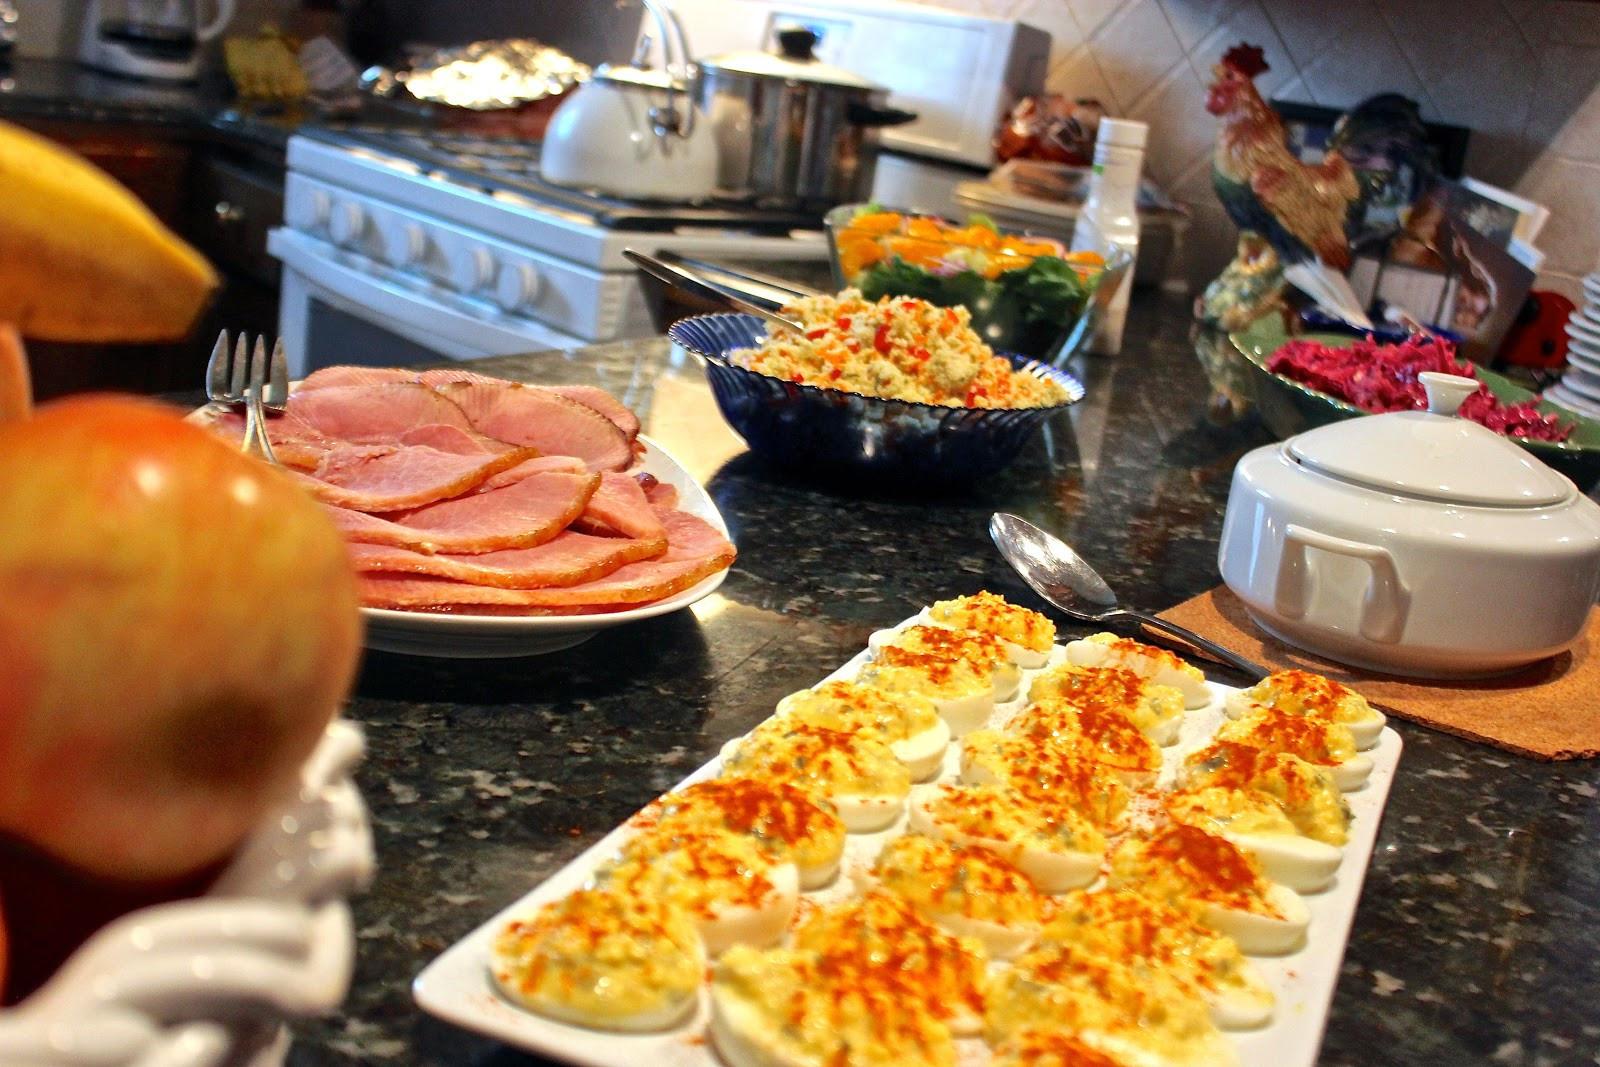 Traditional Easter Dinner Katherine Easter Sunday Recap